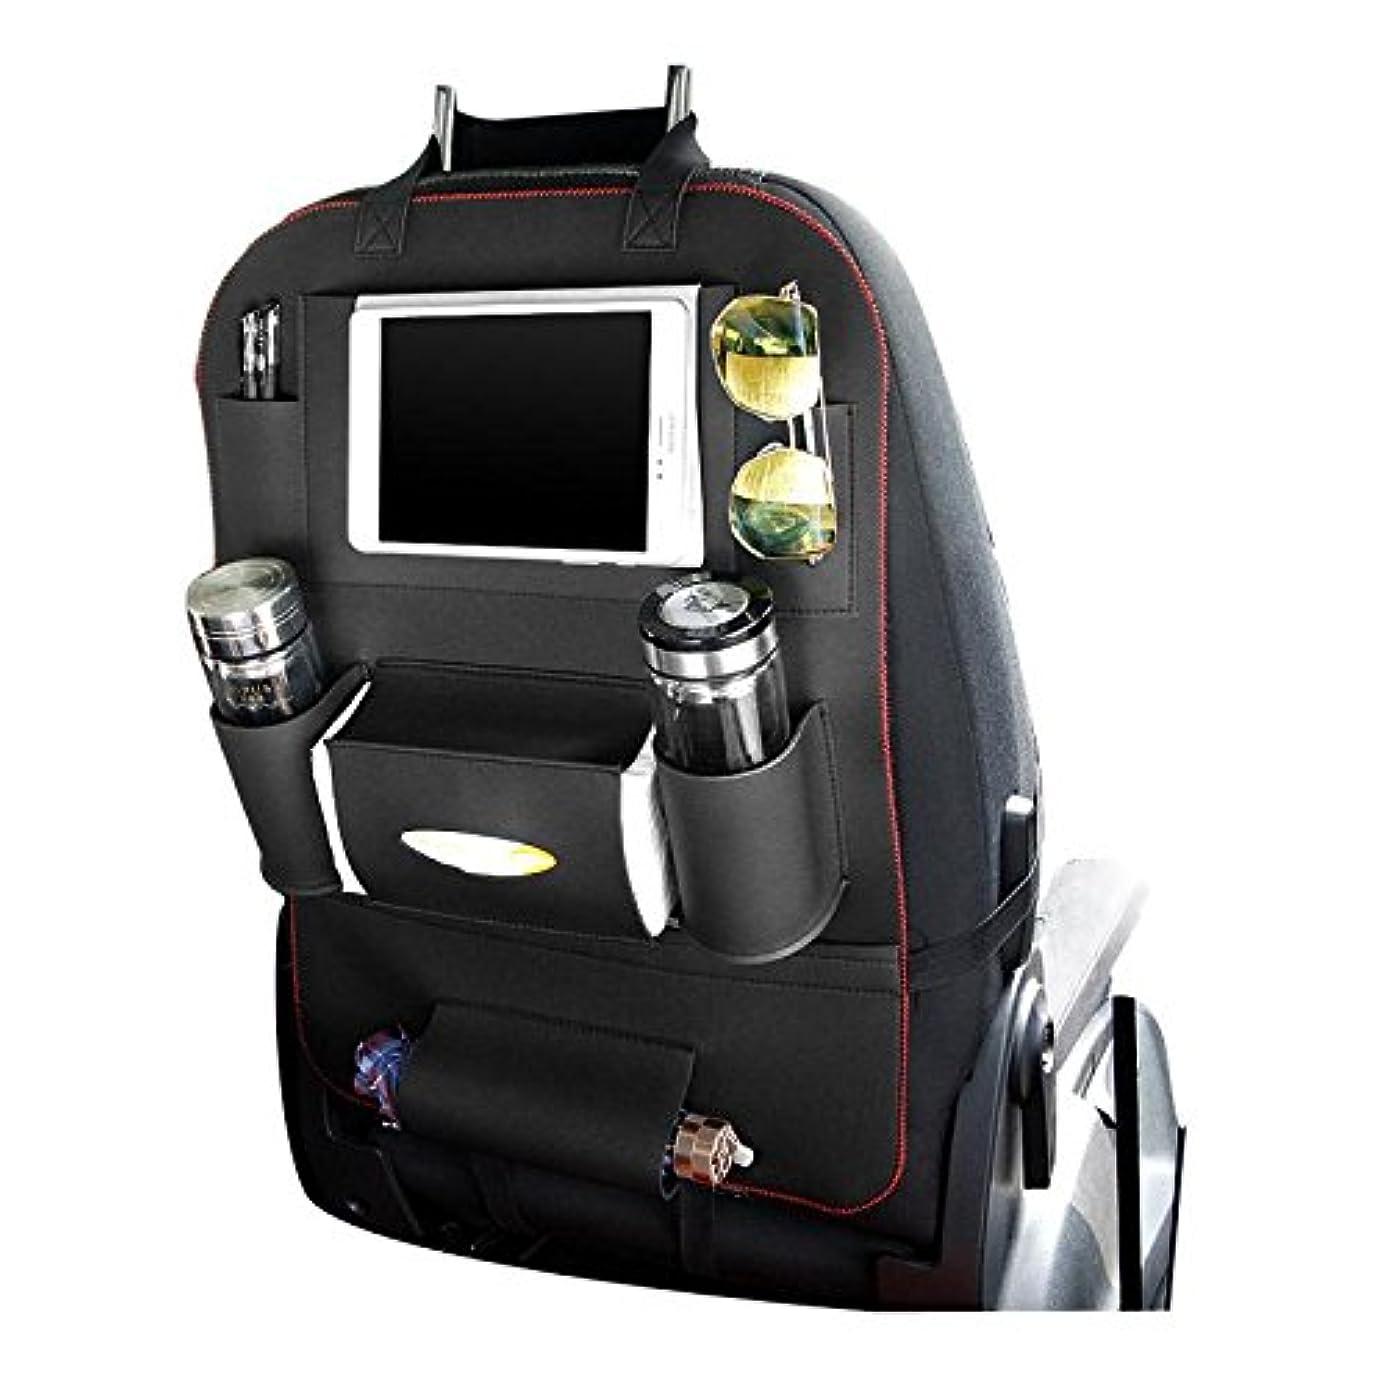 Kobwa Seat Back Organizer+ IPad& Tablet Holder, PU Leather Car Backseat Hanging Kick Mat Protector Travel Storage Bag, To Organize Phone/ Tissue Box/ Umbrella/ Baby Toys/ Bottles (Black+ Red)